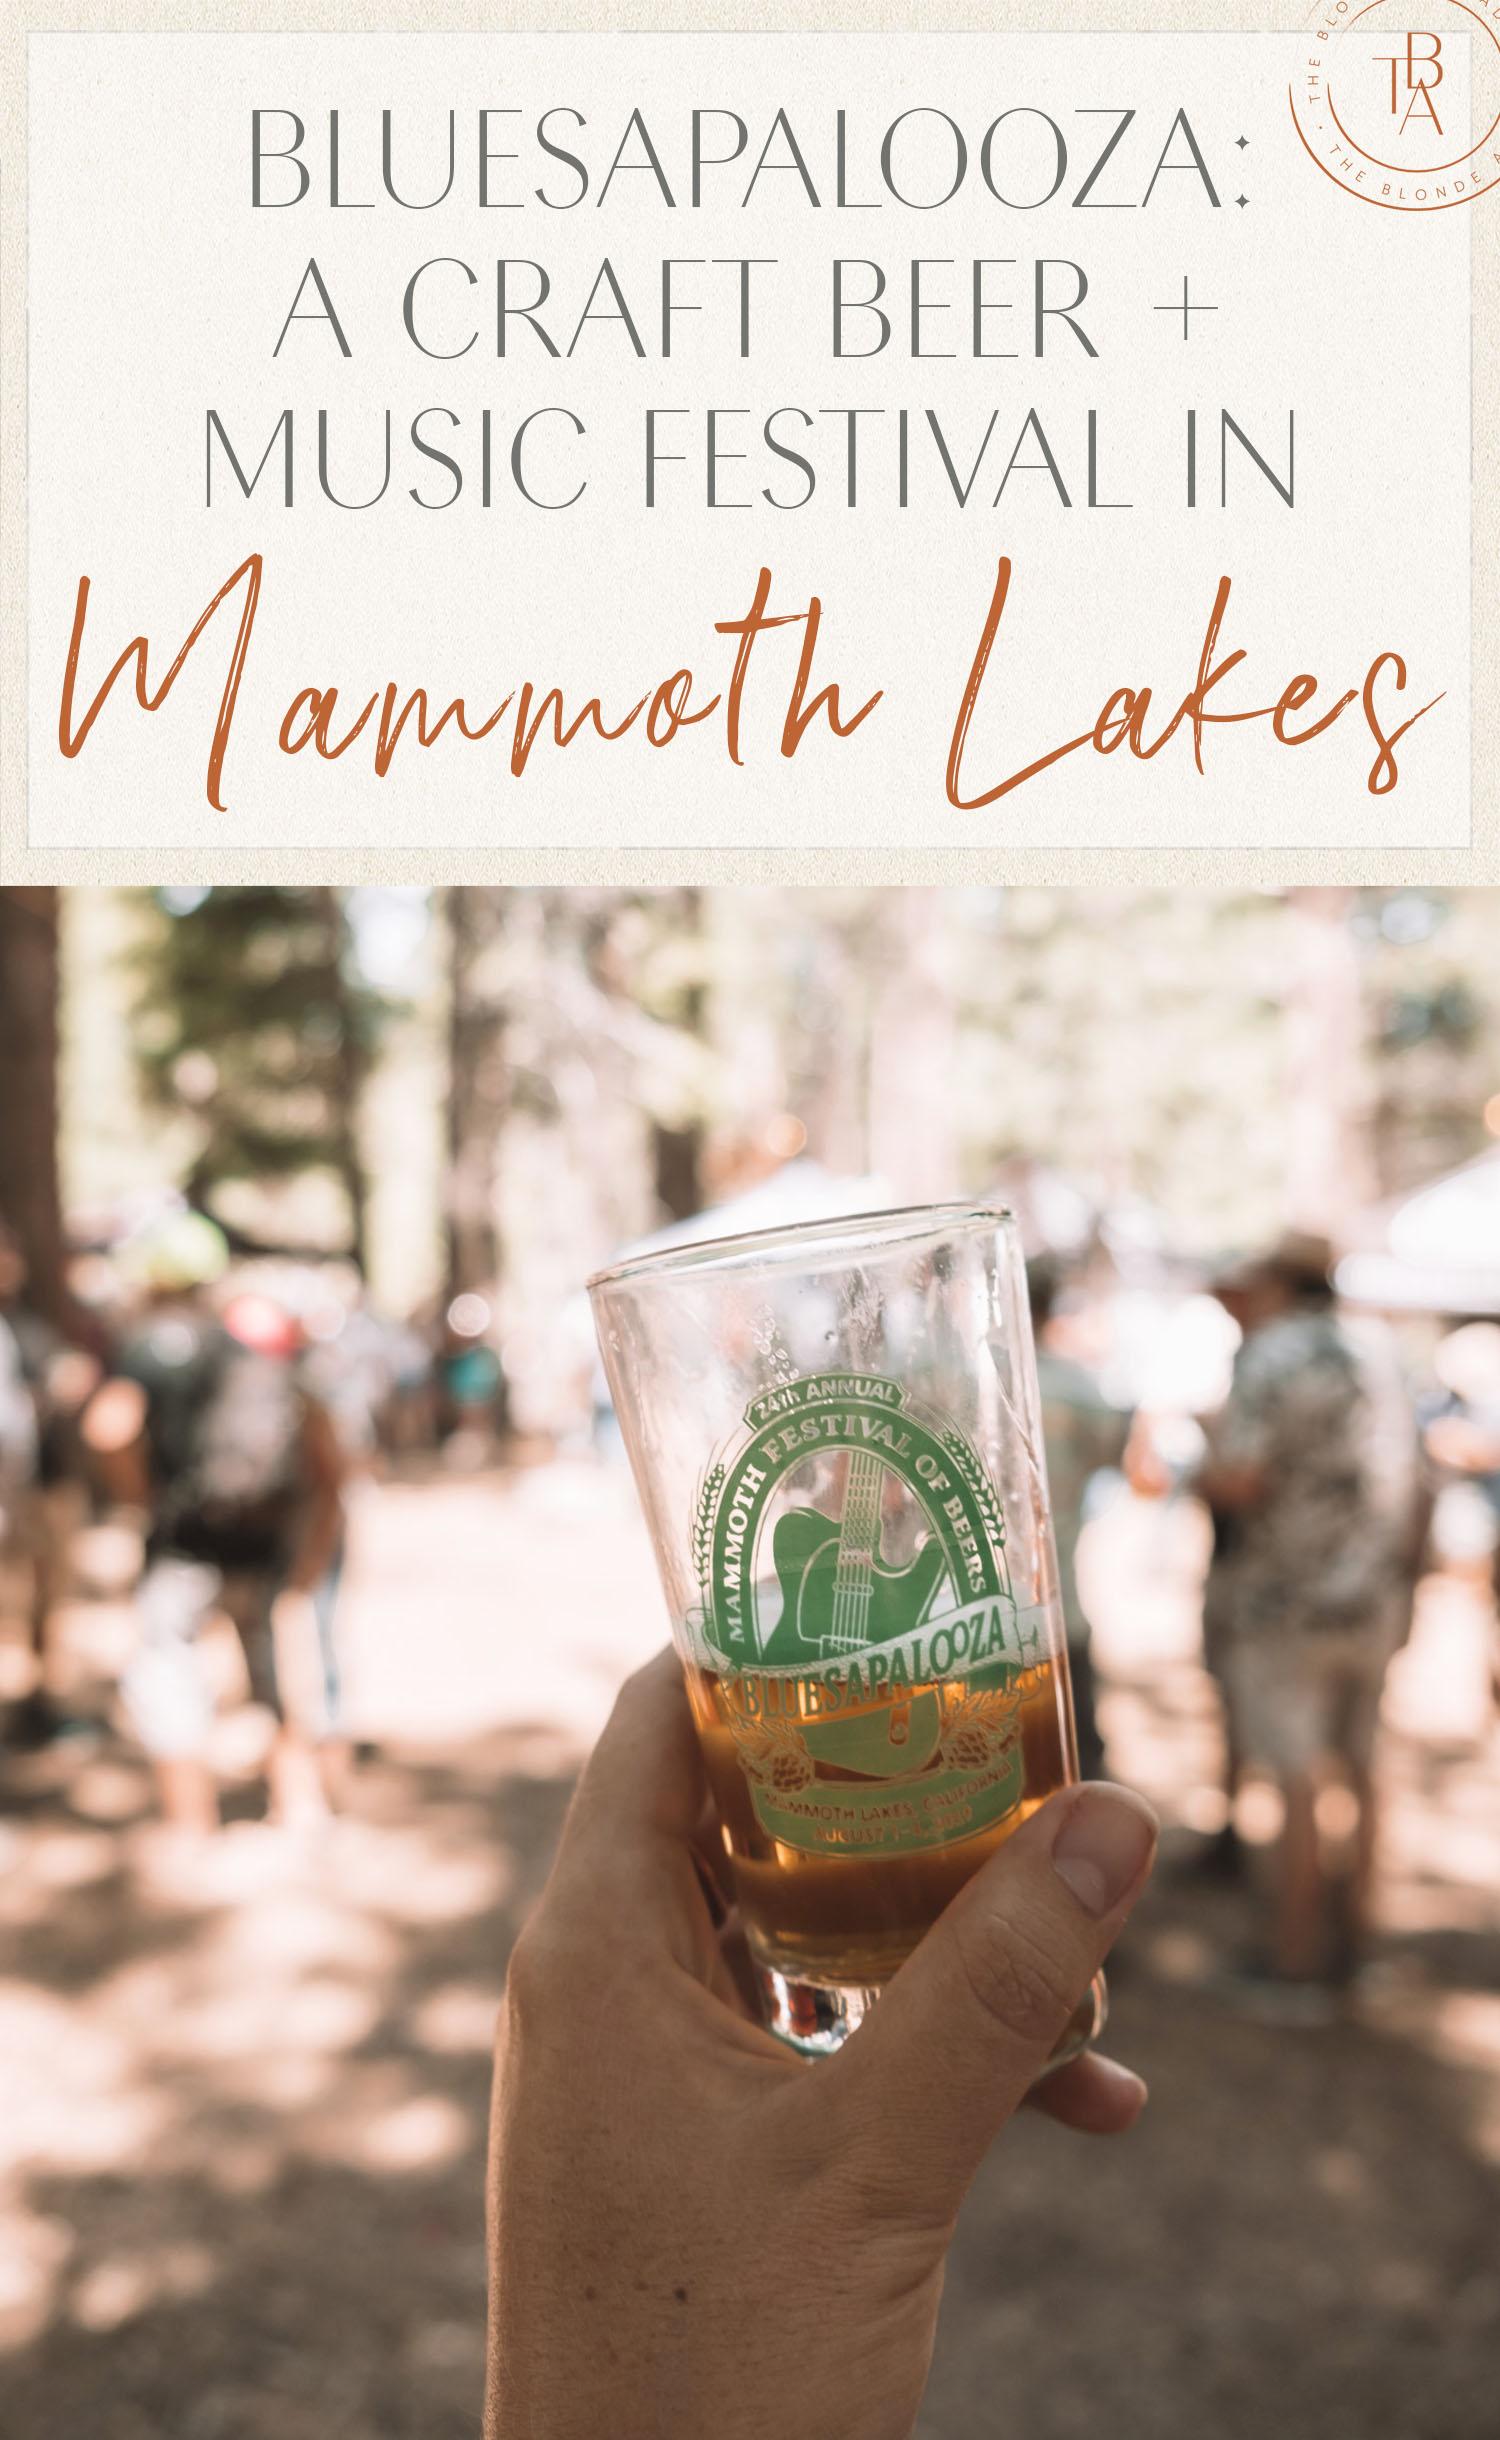 Bluesapalooza Craft Beer Music Festival Mammoth Lakes